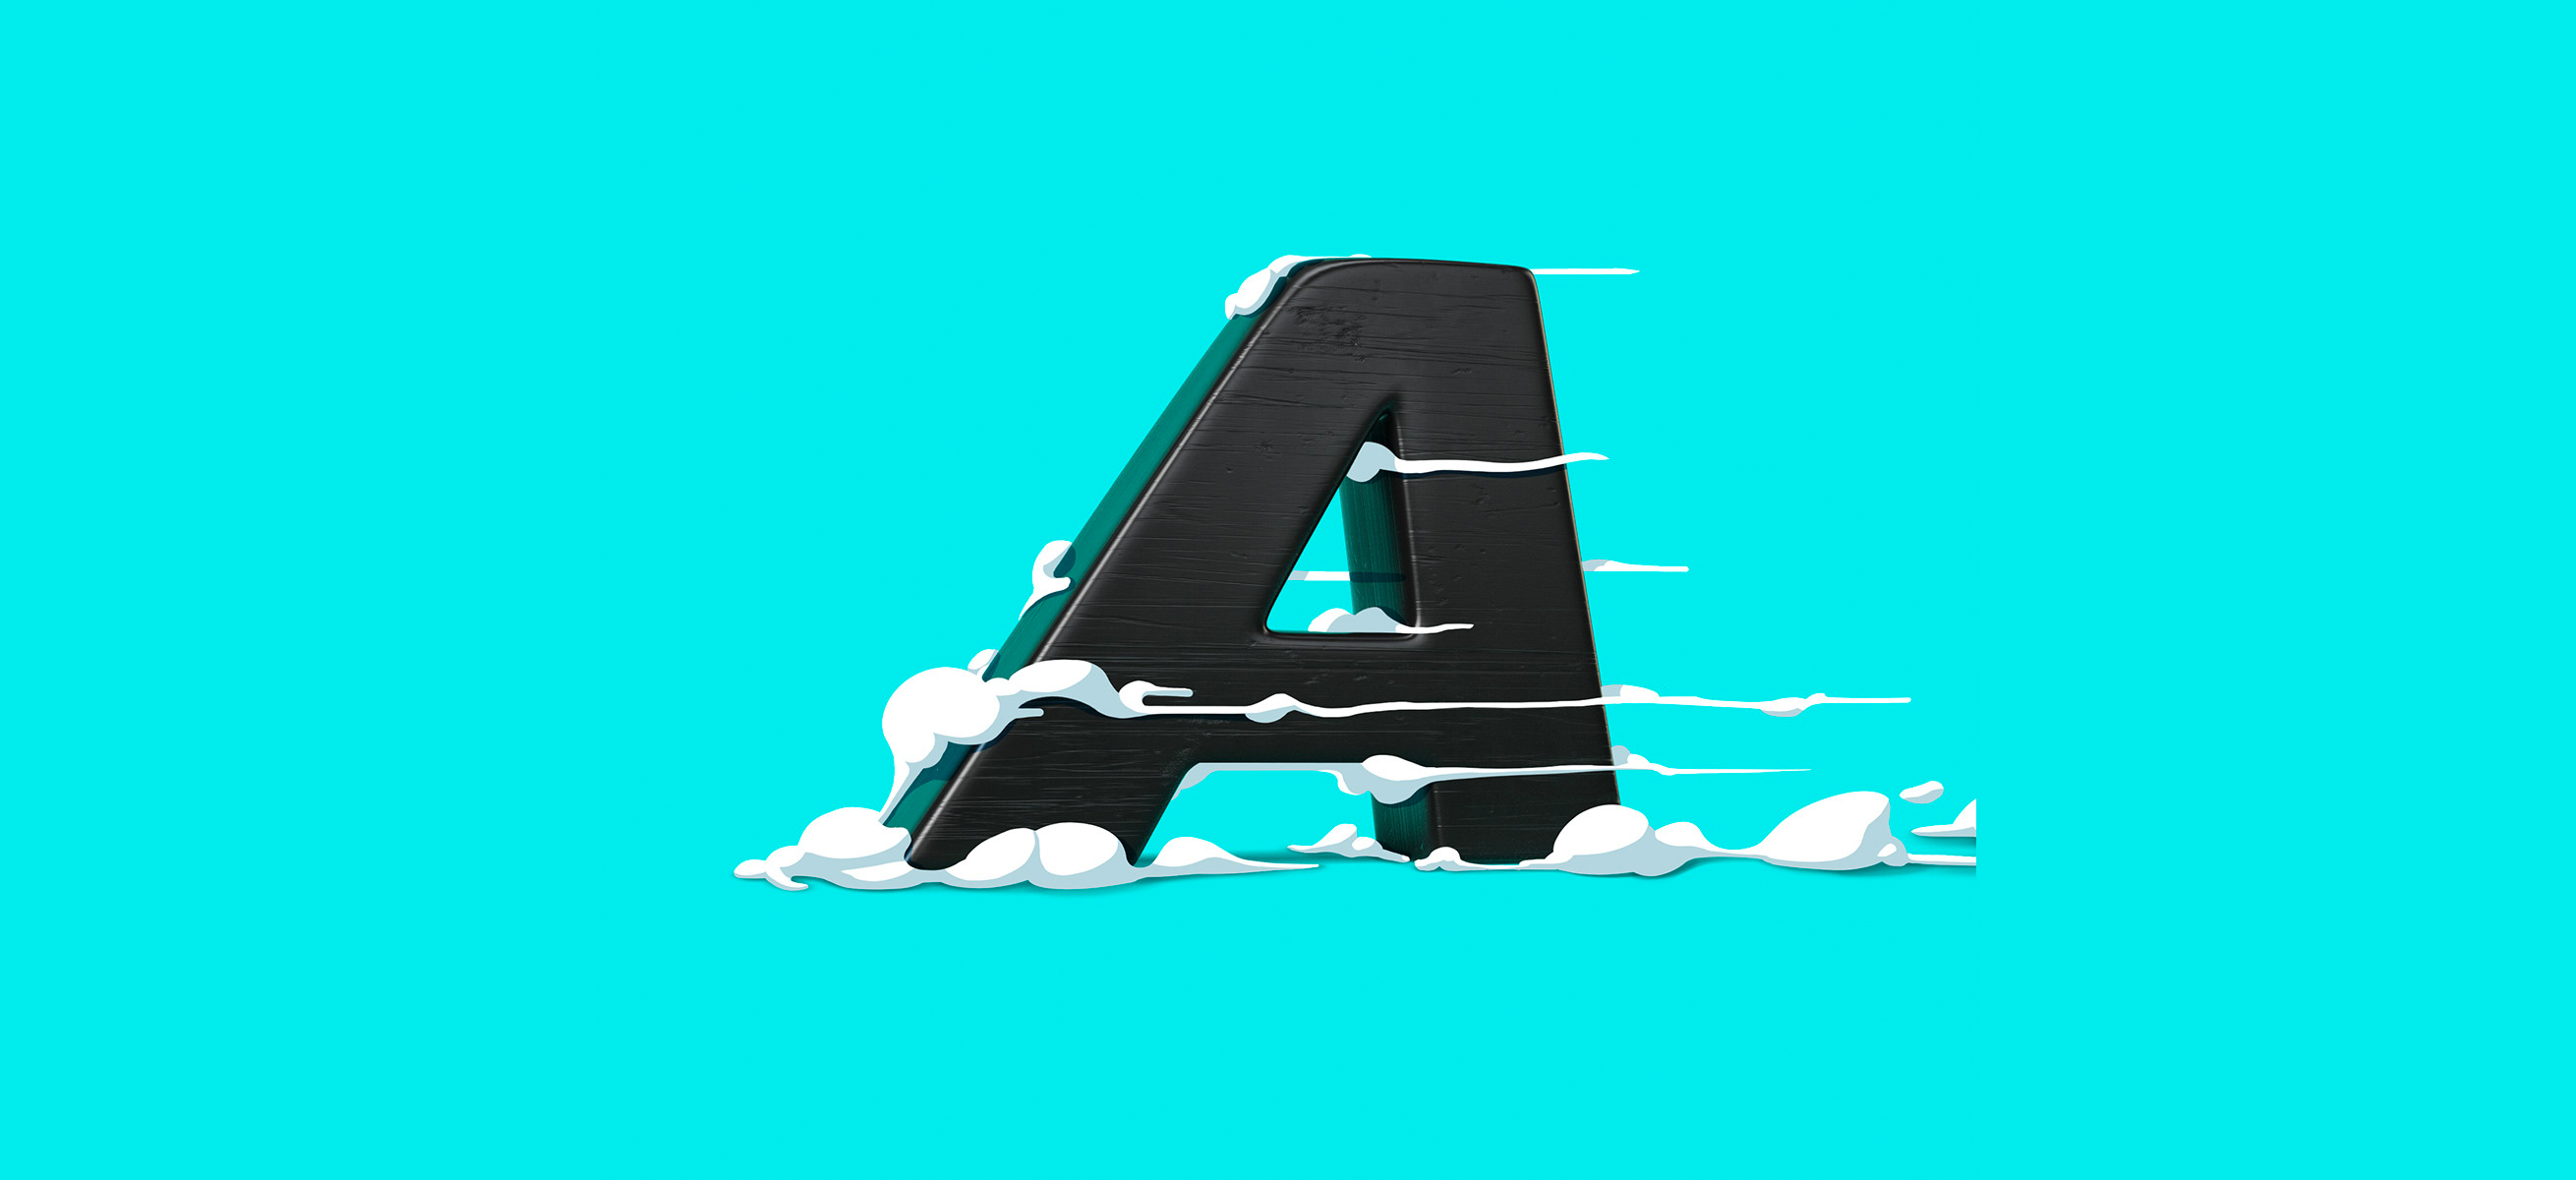 Typography: Letter Jam the Tooned Alphabet